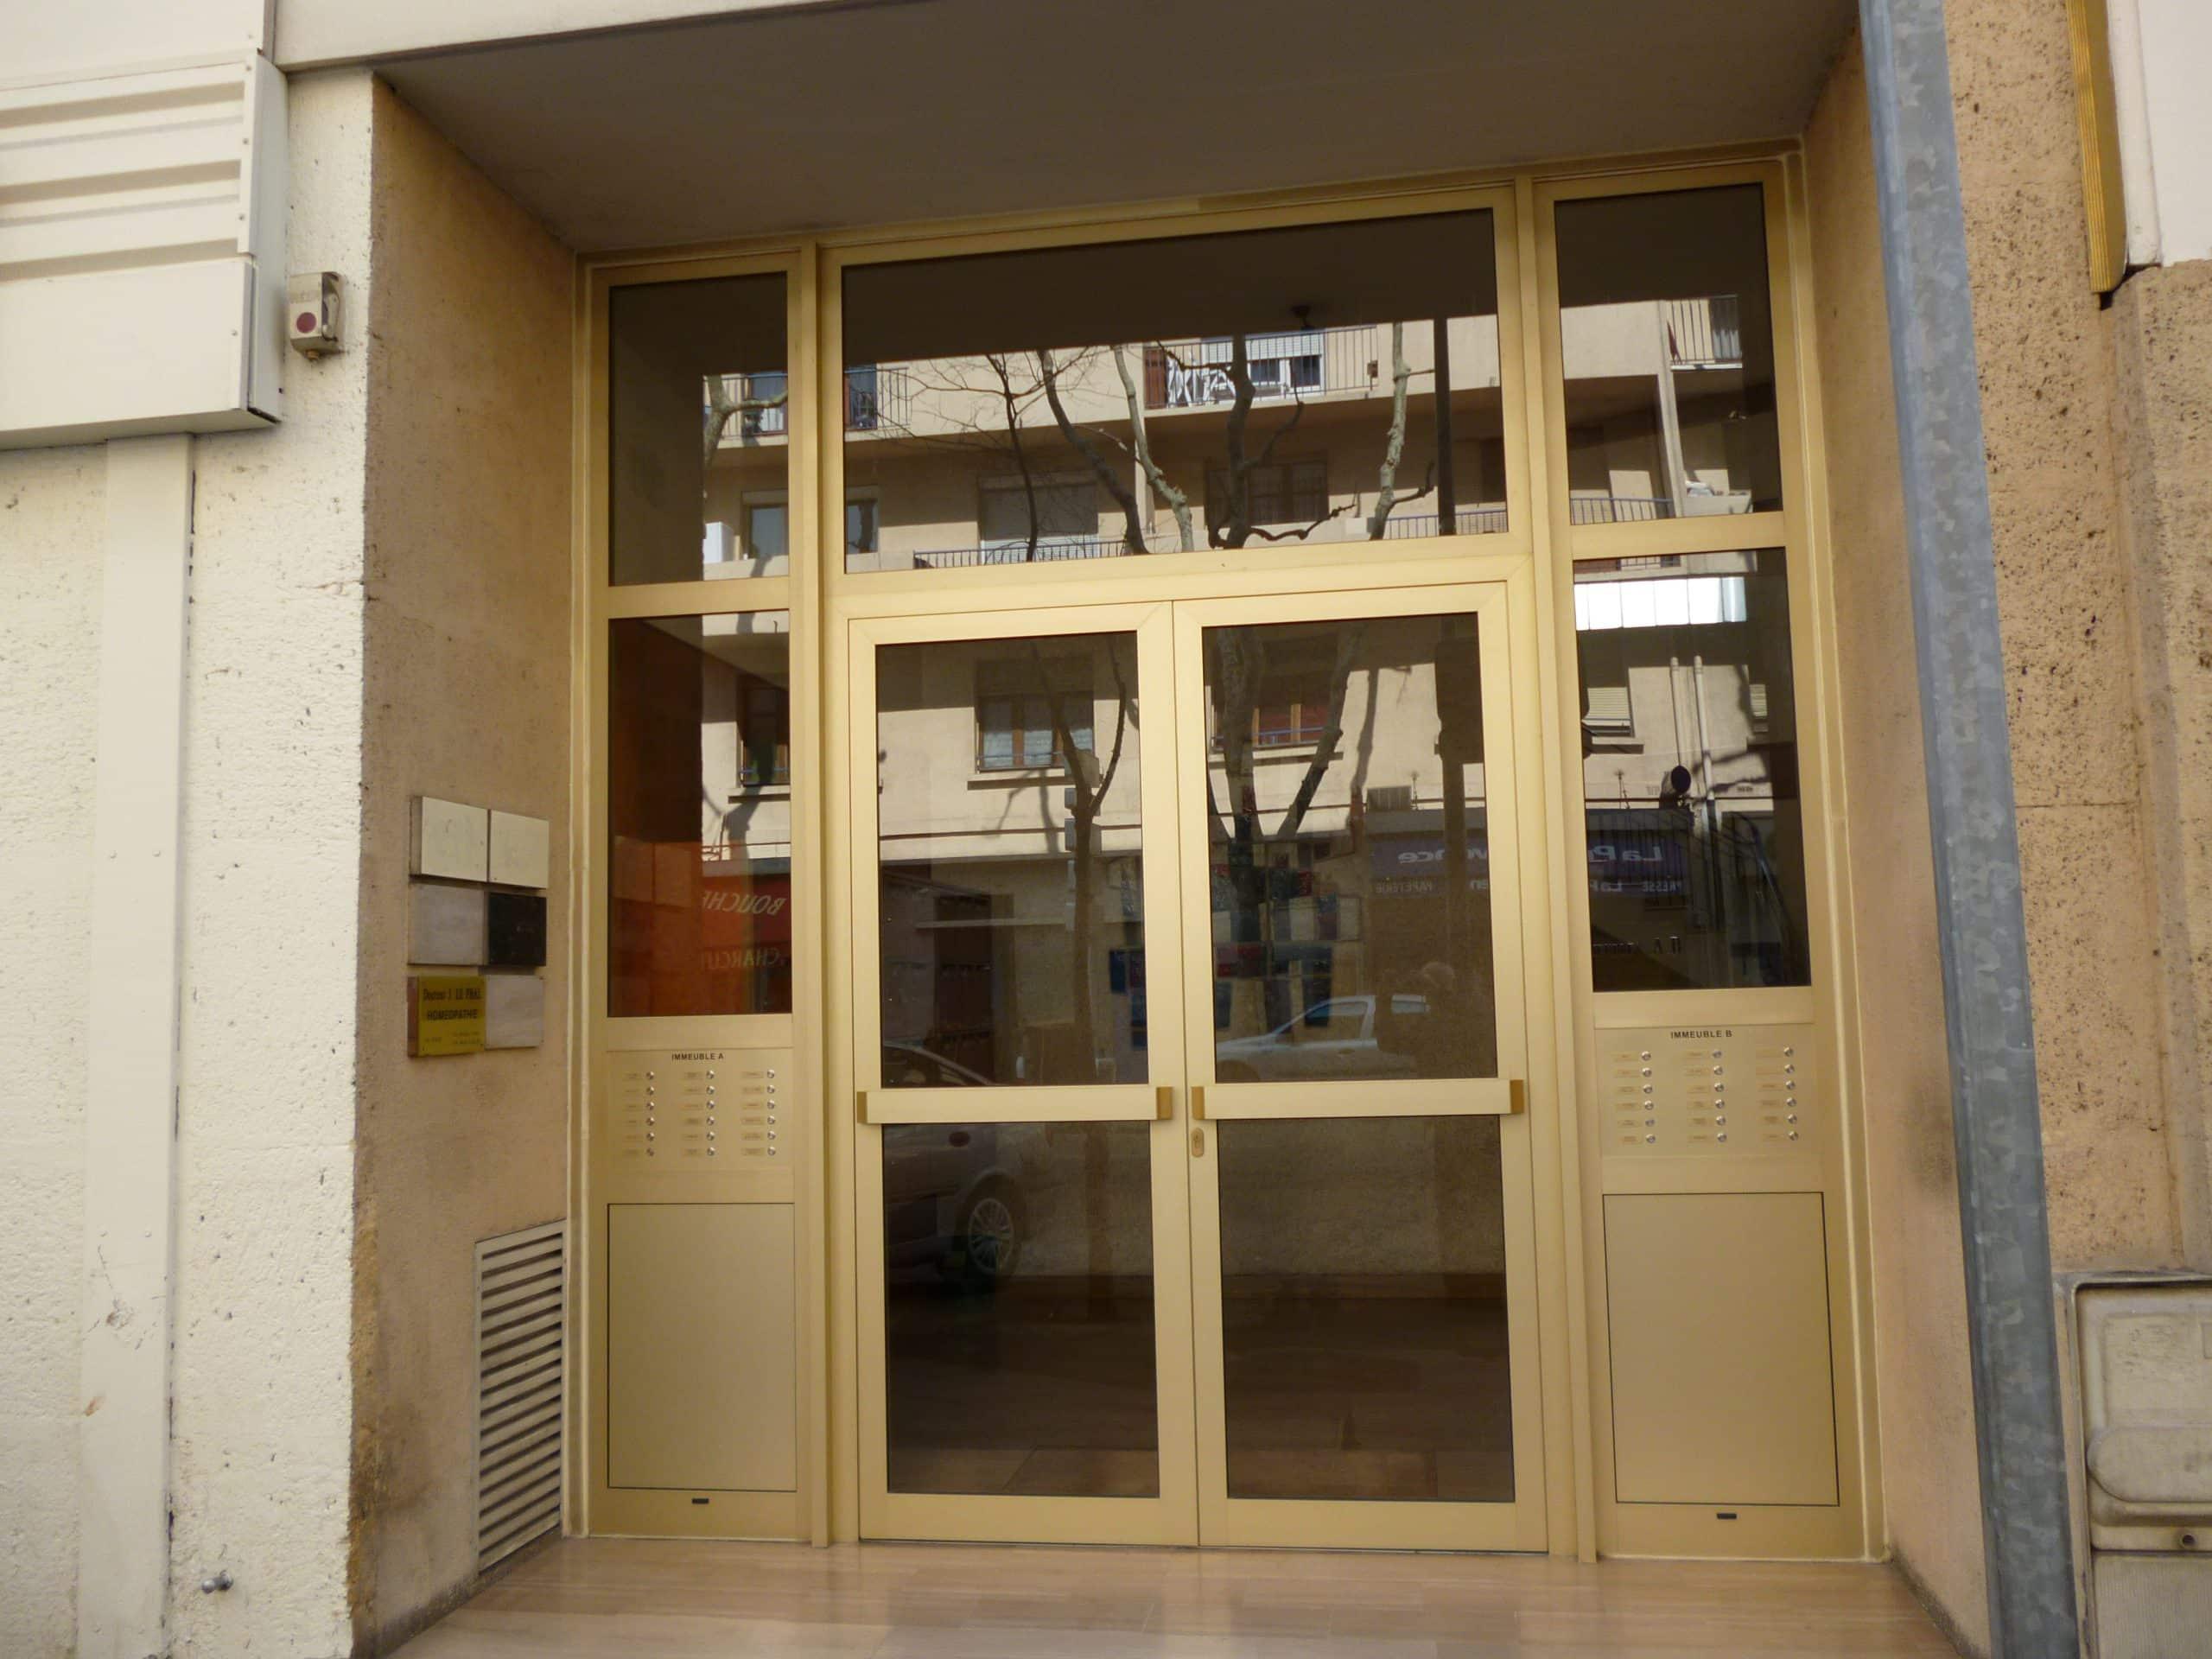 Portes d immeuble marseille technic habitat for Porte 4 marseille